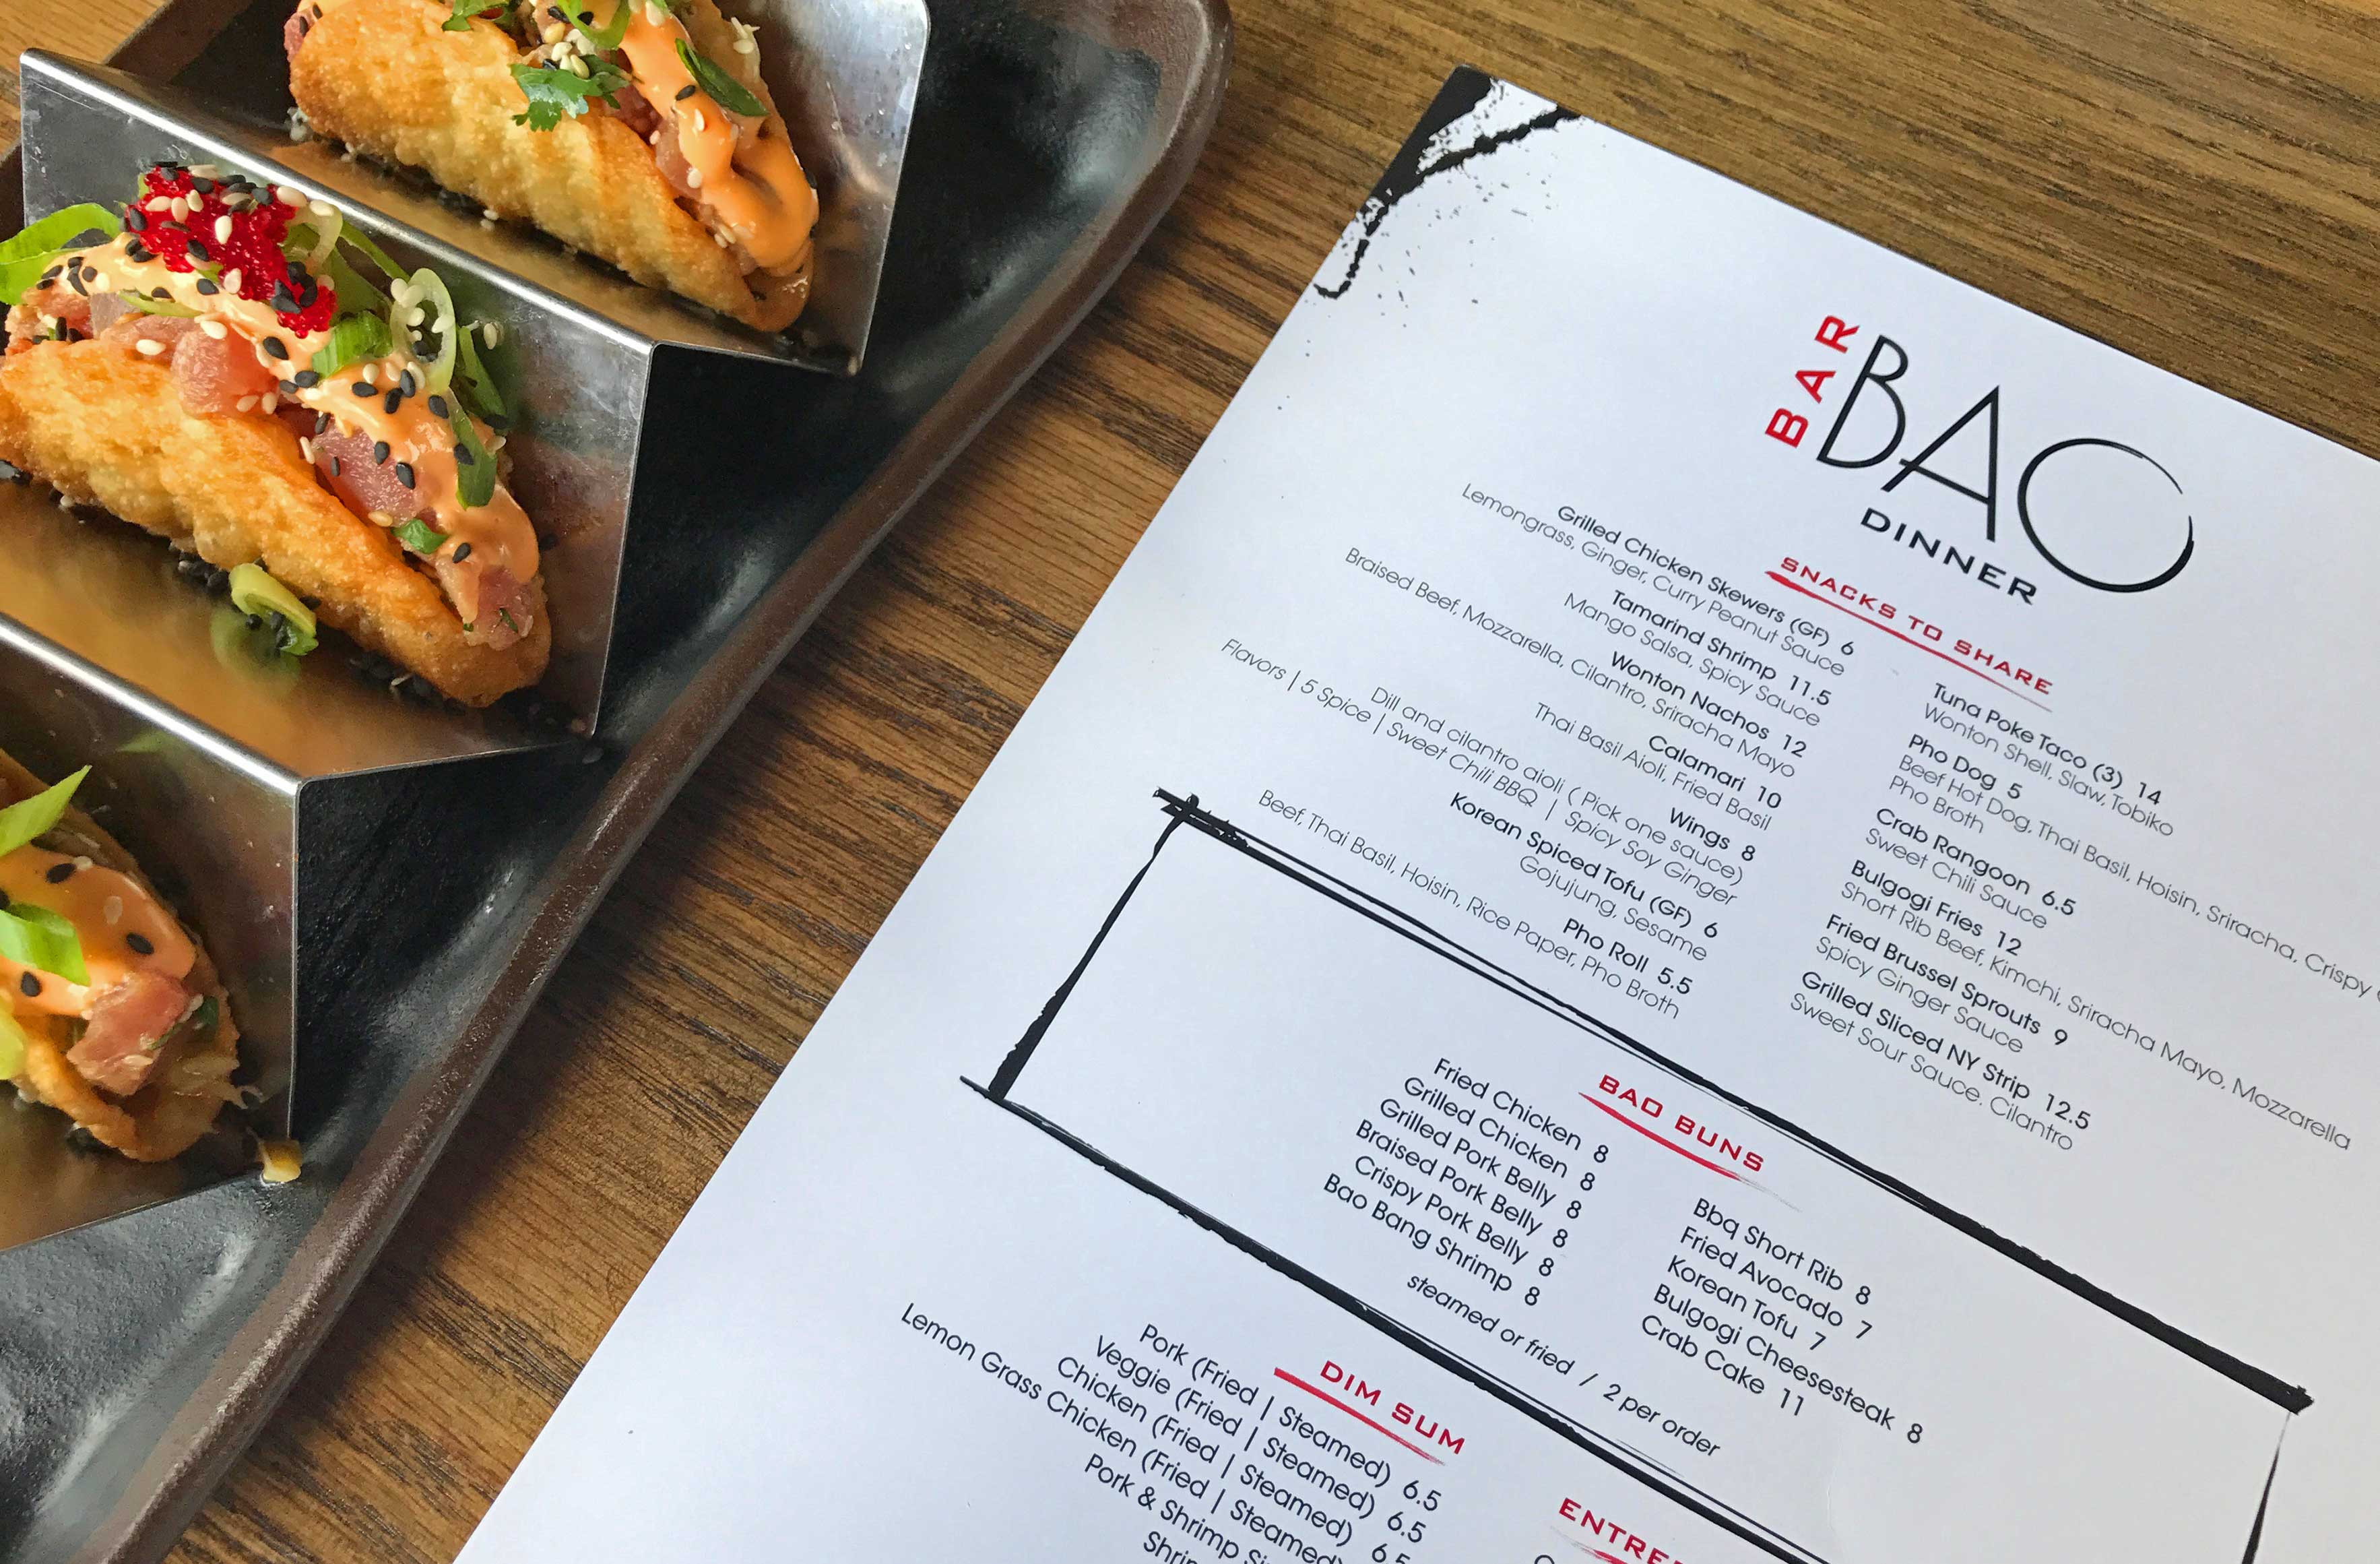 bar bao menu